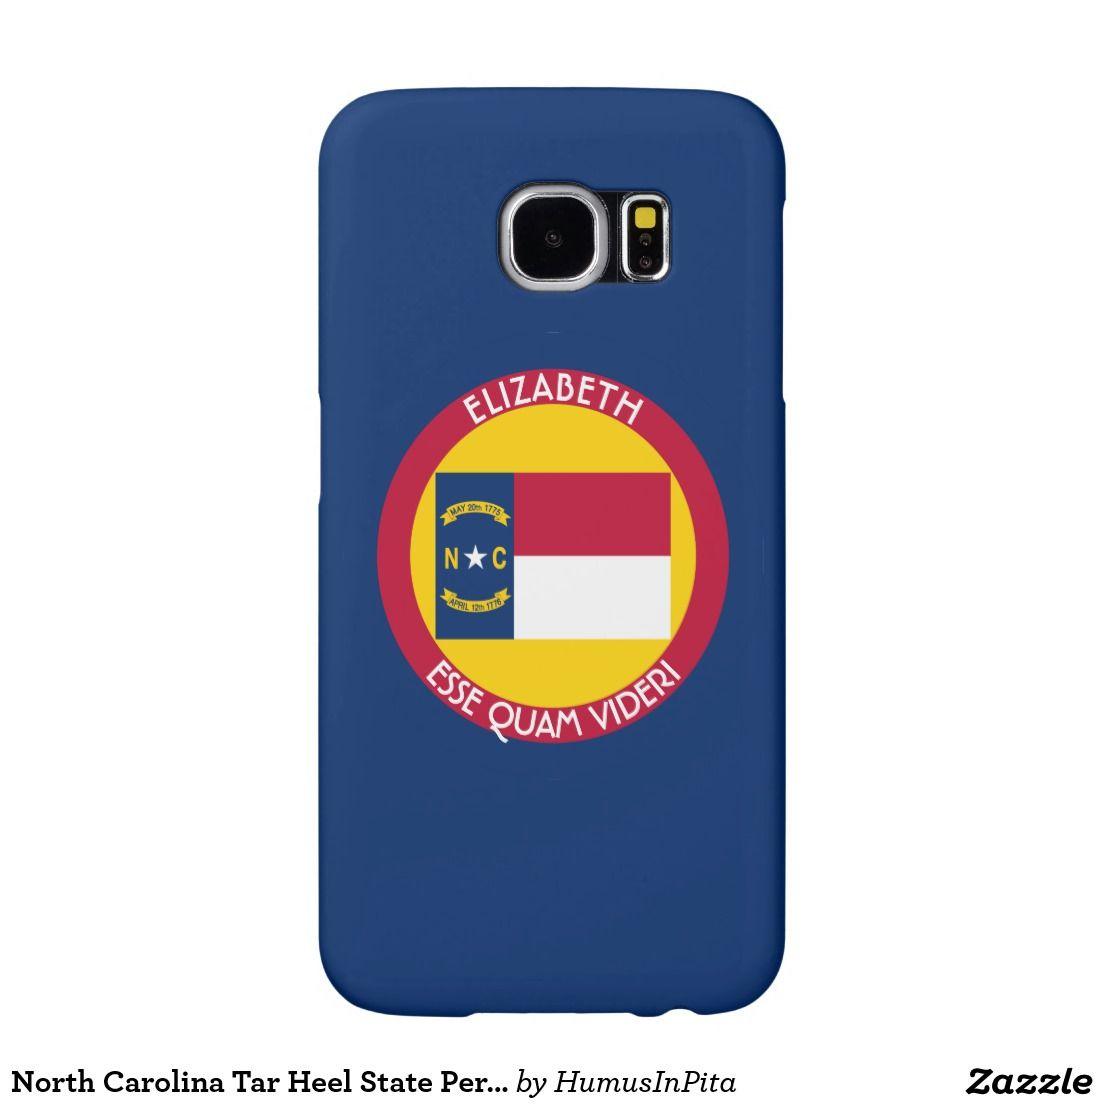 North Carolina Tar Heel State Personalized Flag Samsung Galaxy S6 Cases